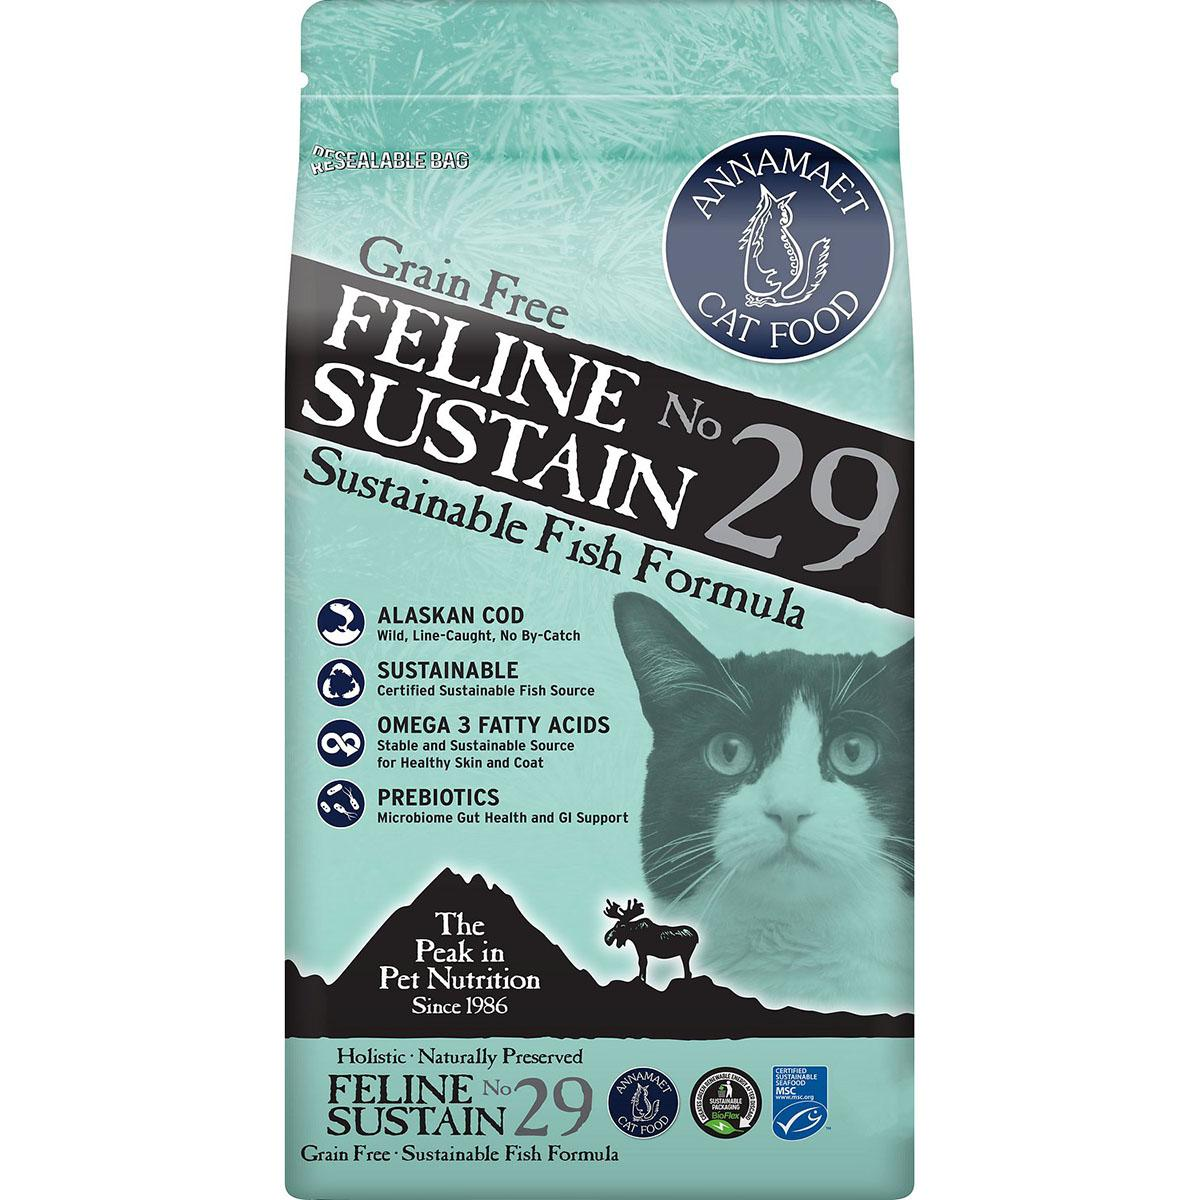 Annamaet Grain-Free Feline Sustain No. 29 Dry Cat Food